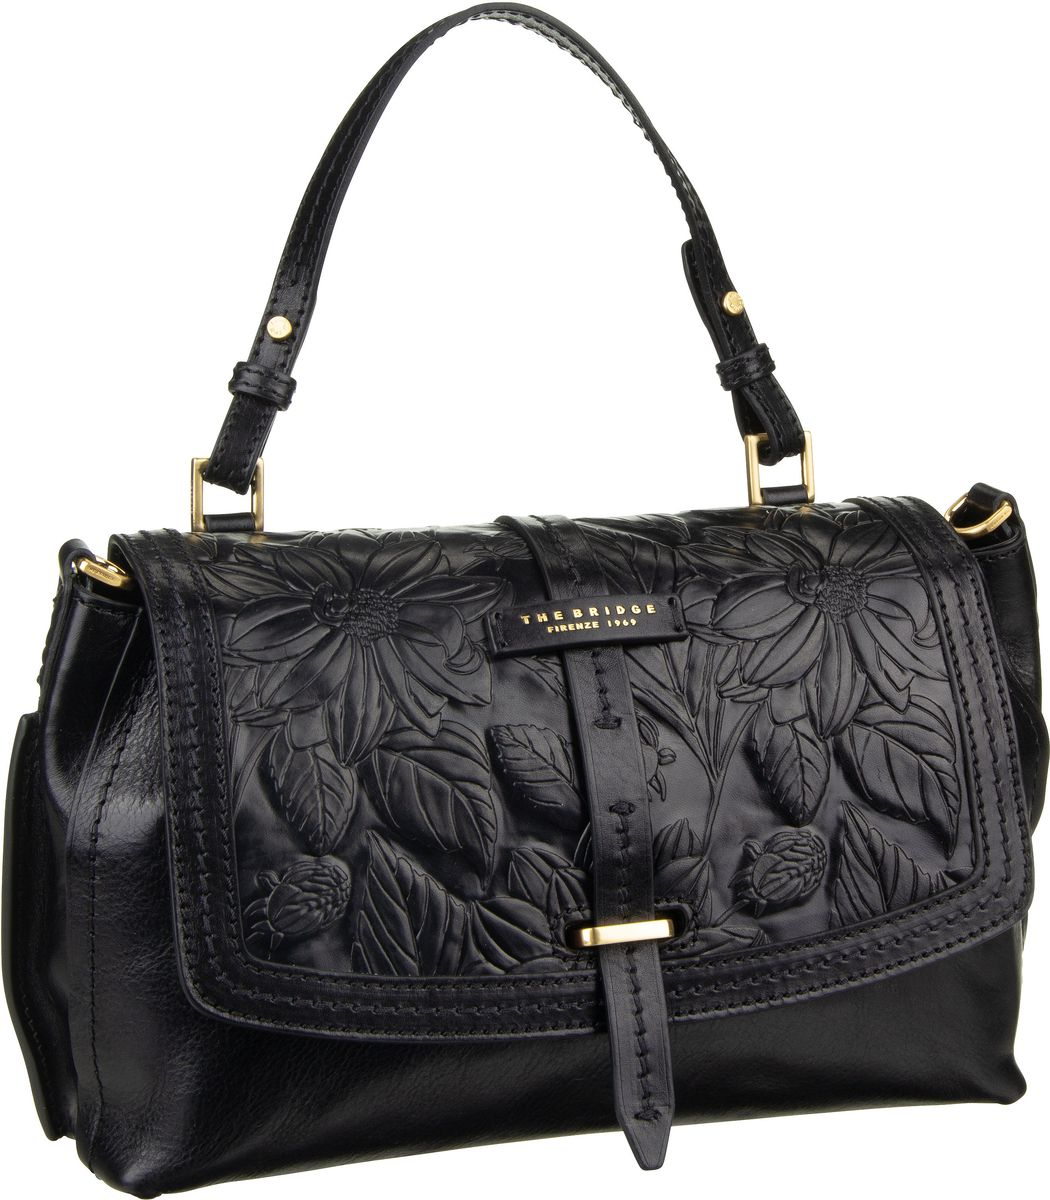 Handtasche Capraia Handtasche 3407 Nero/Oro